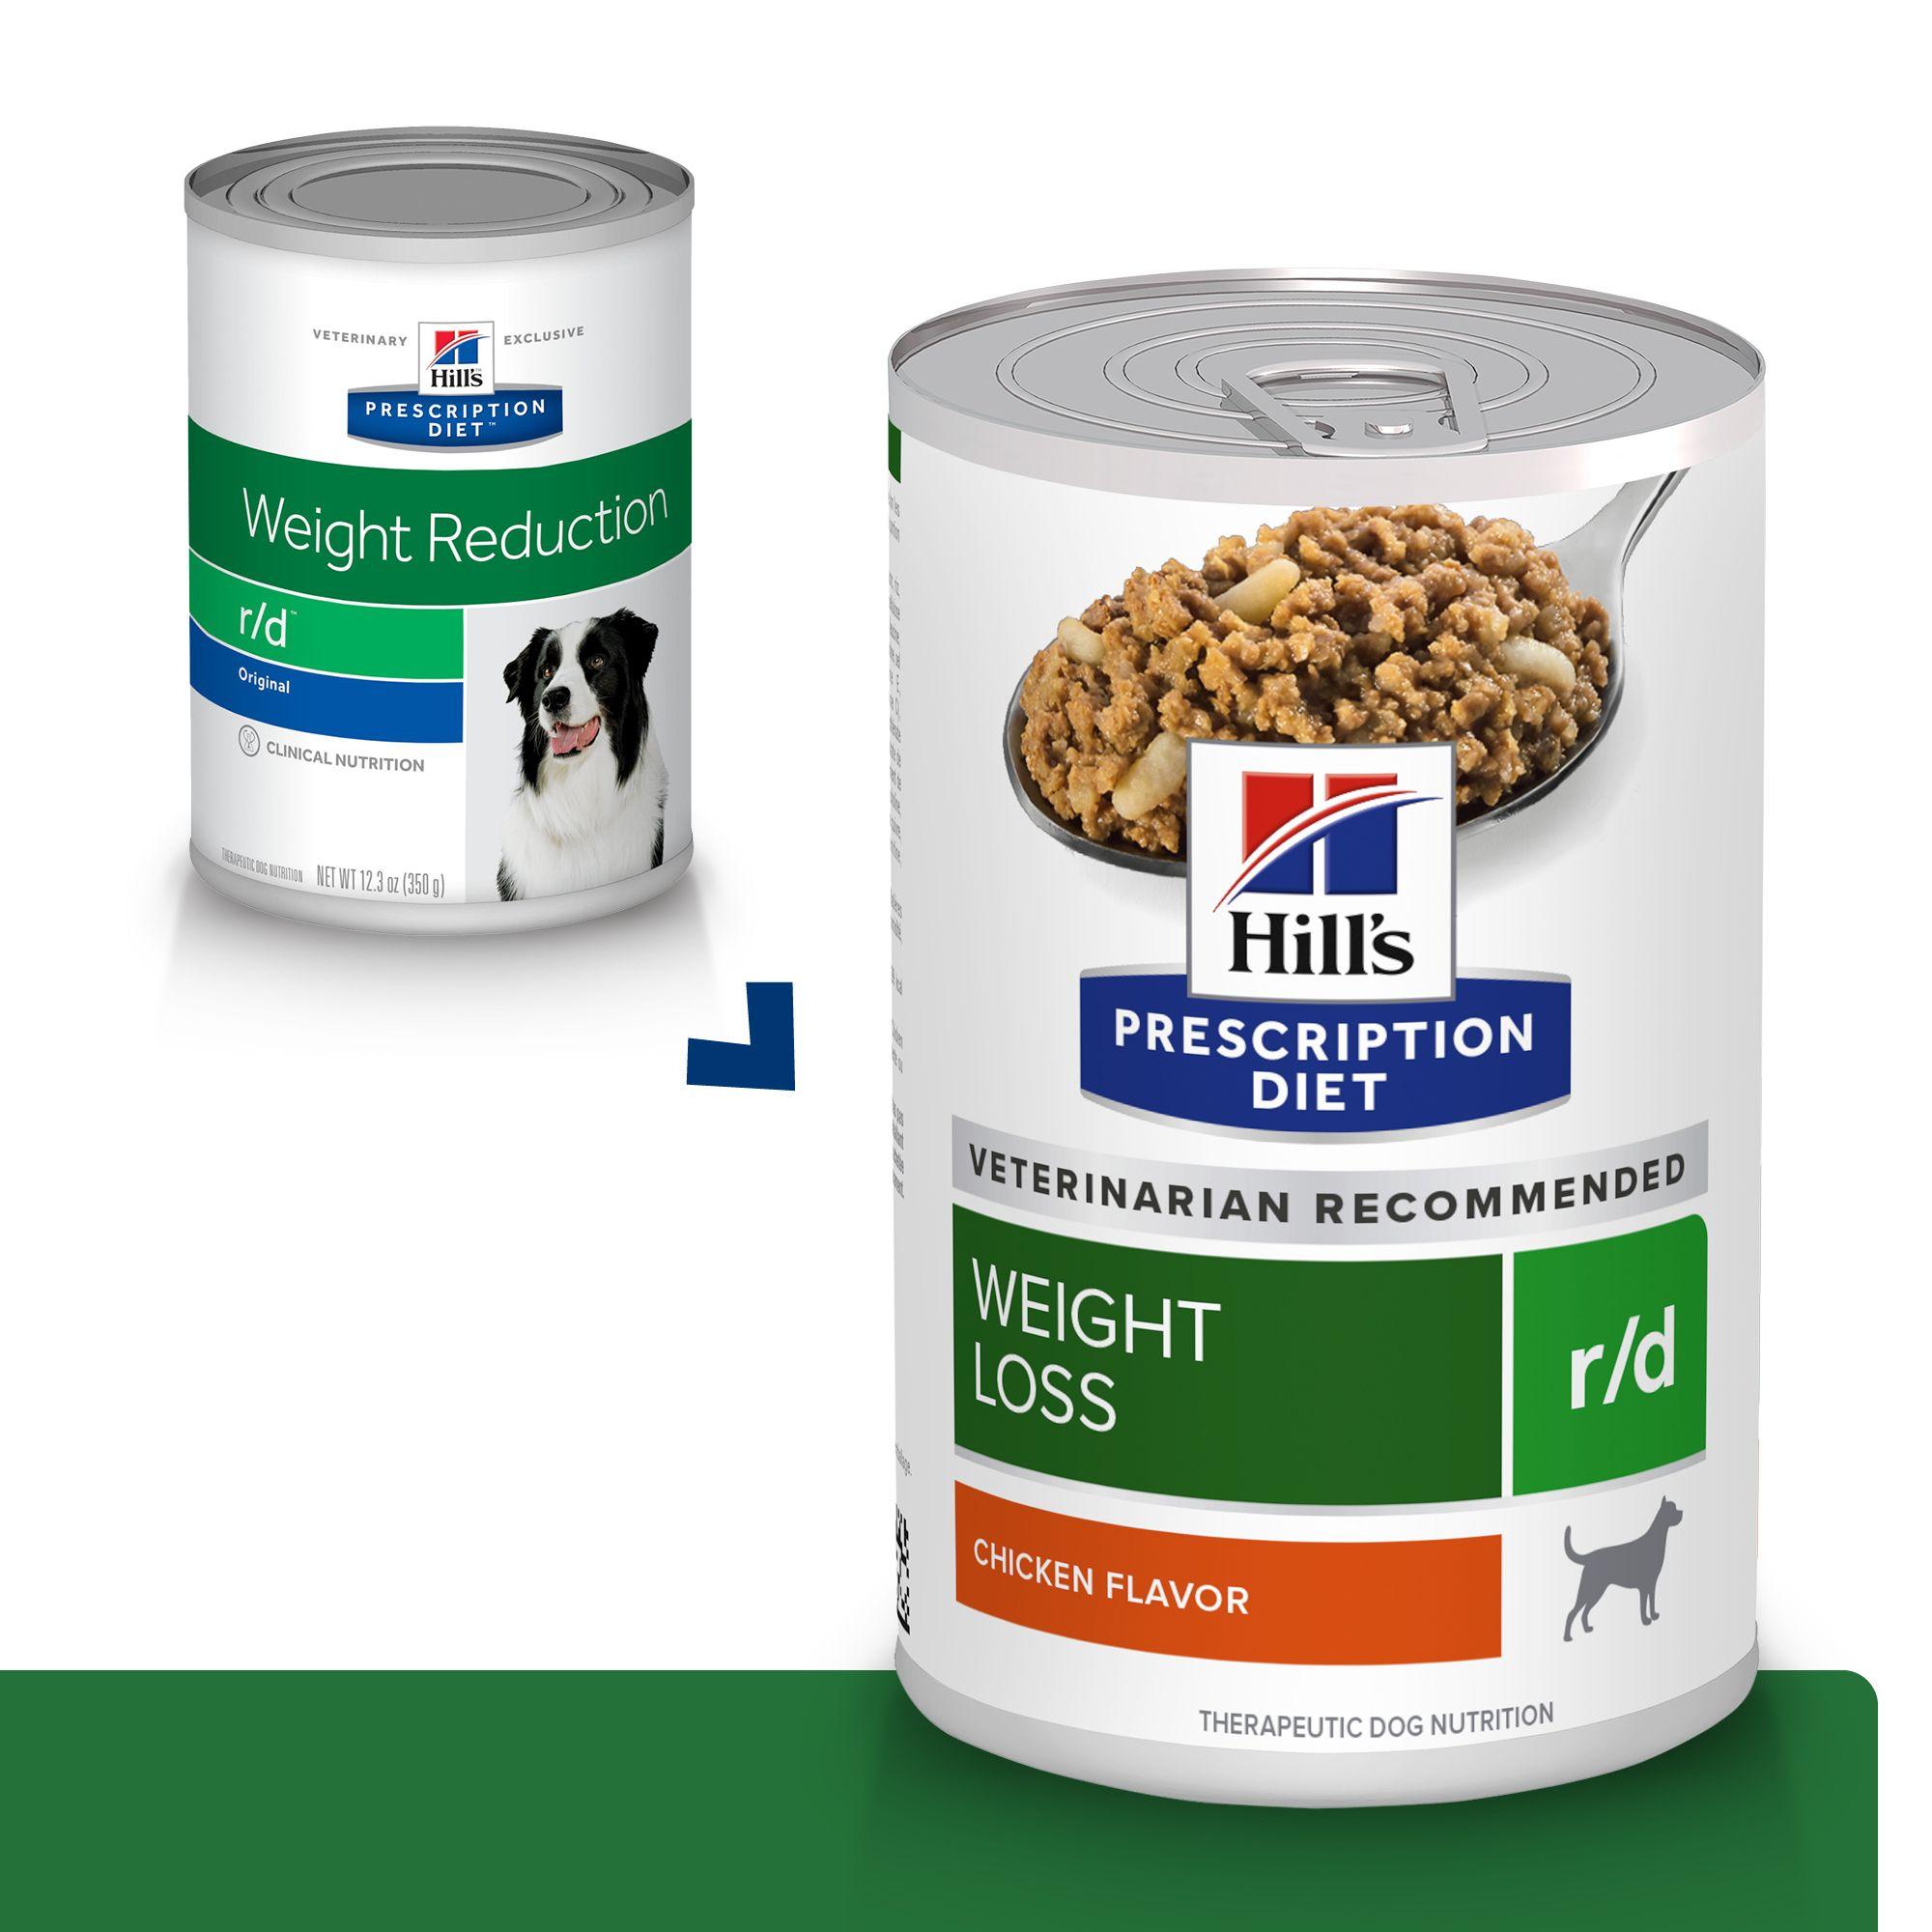 052742701400 UPC - Dog Food | UPC Lookup